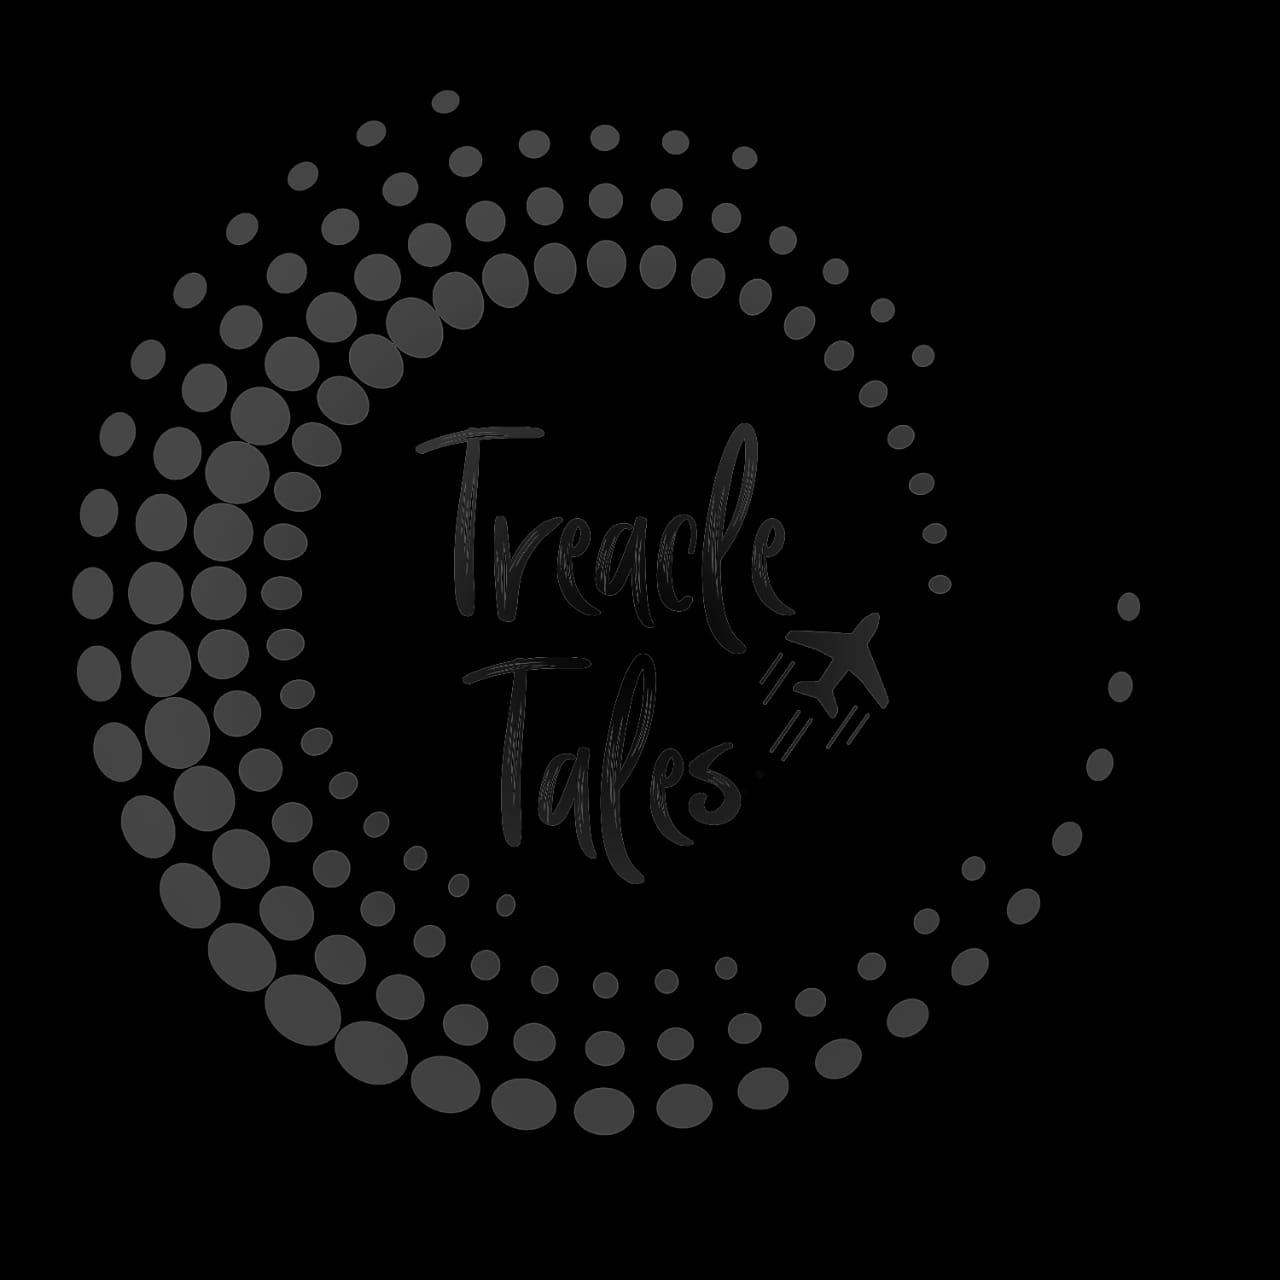 Treacle Tales